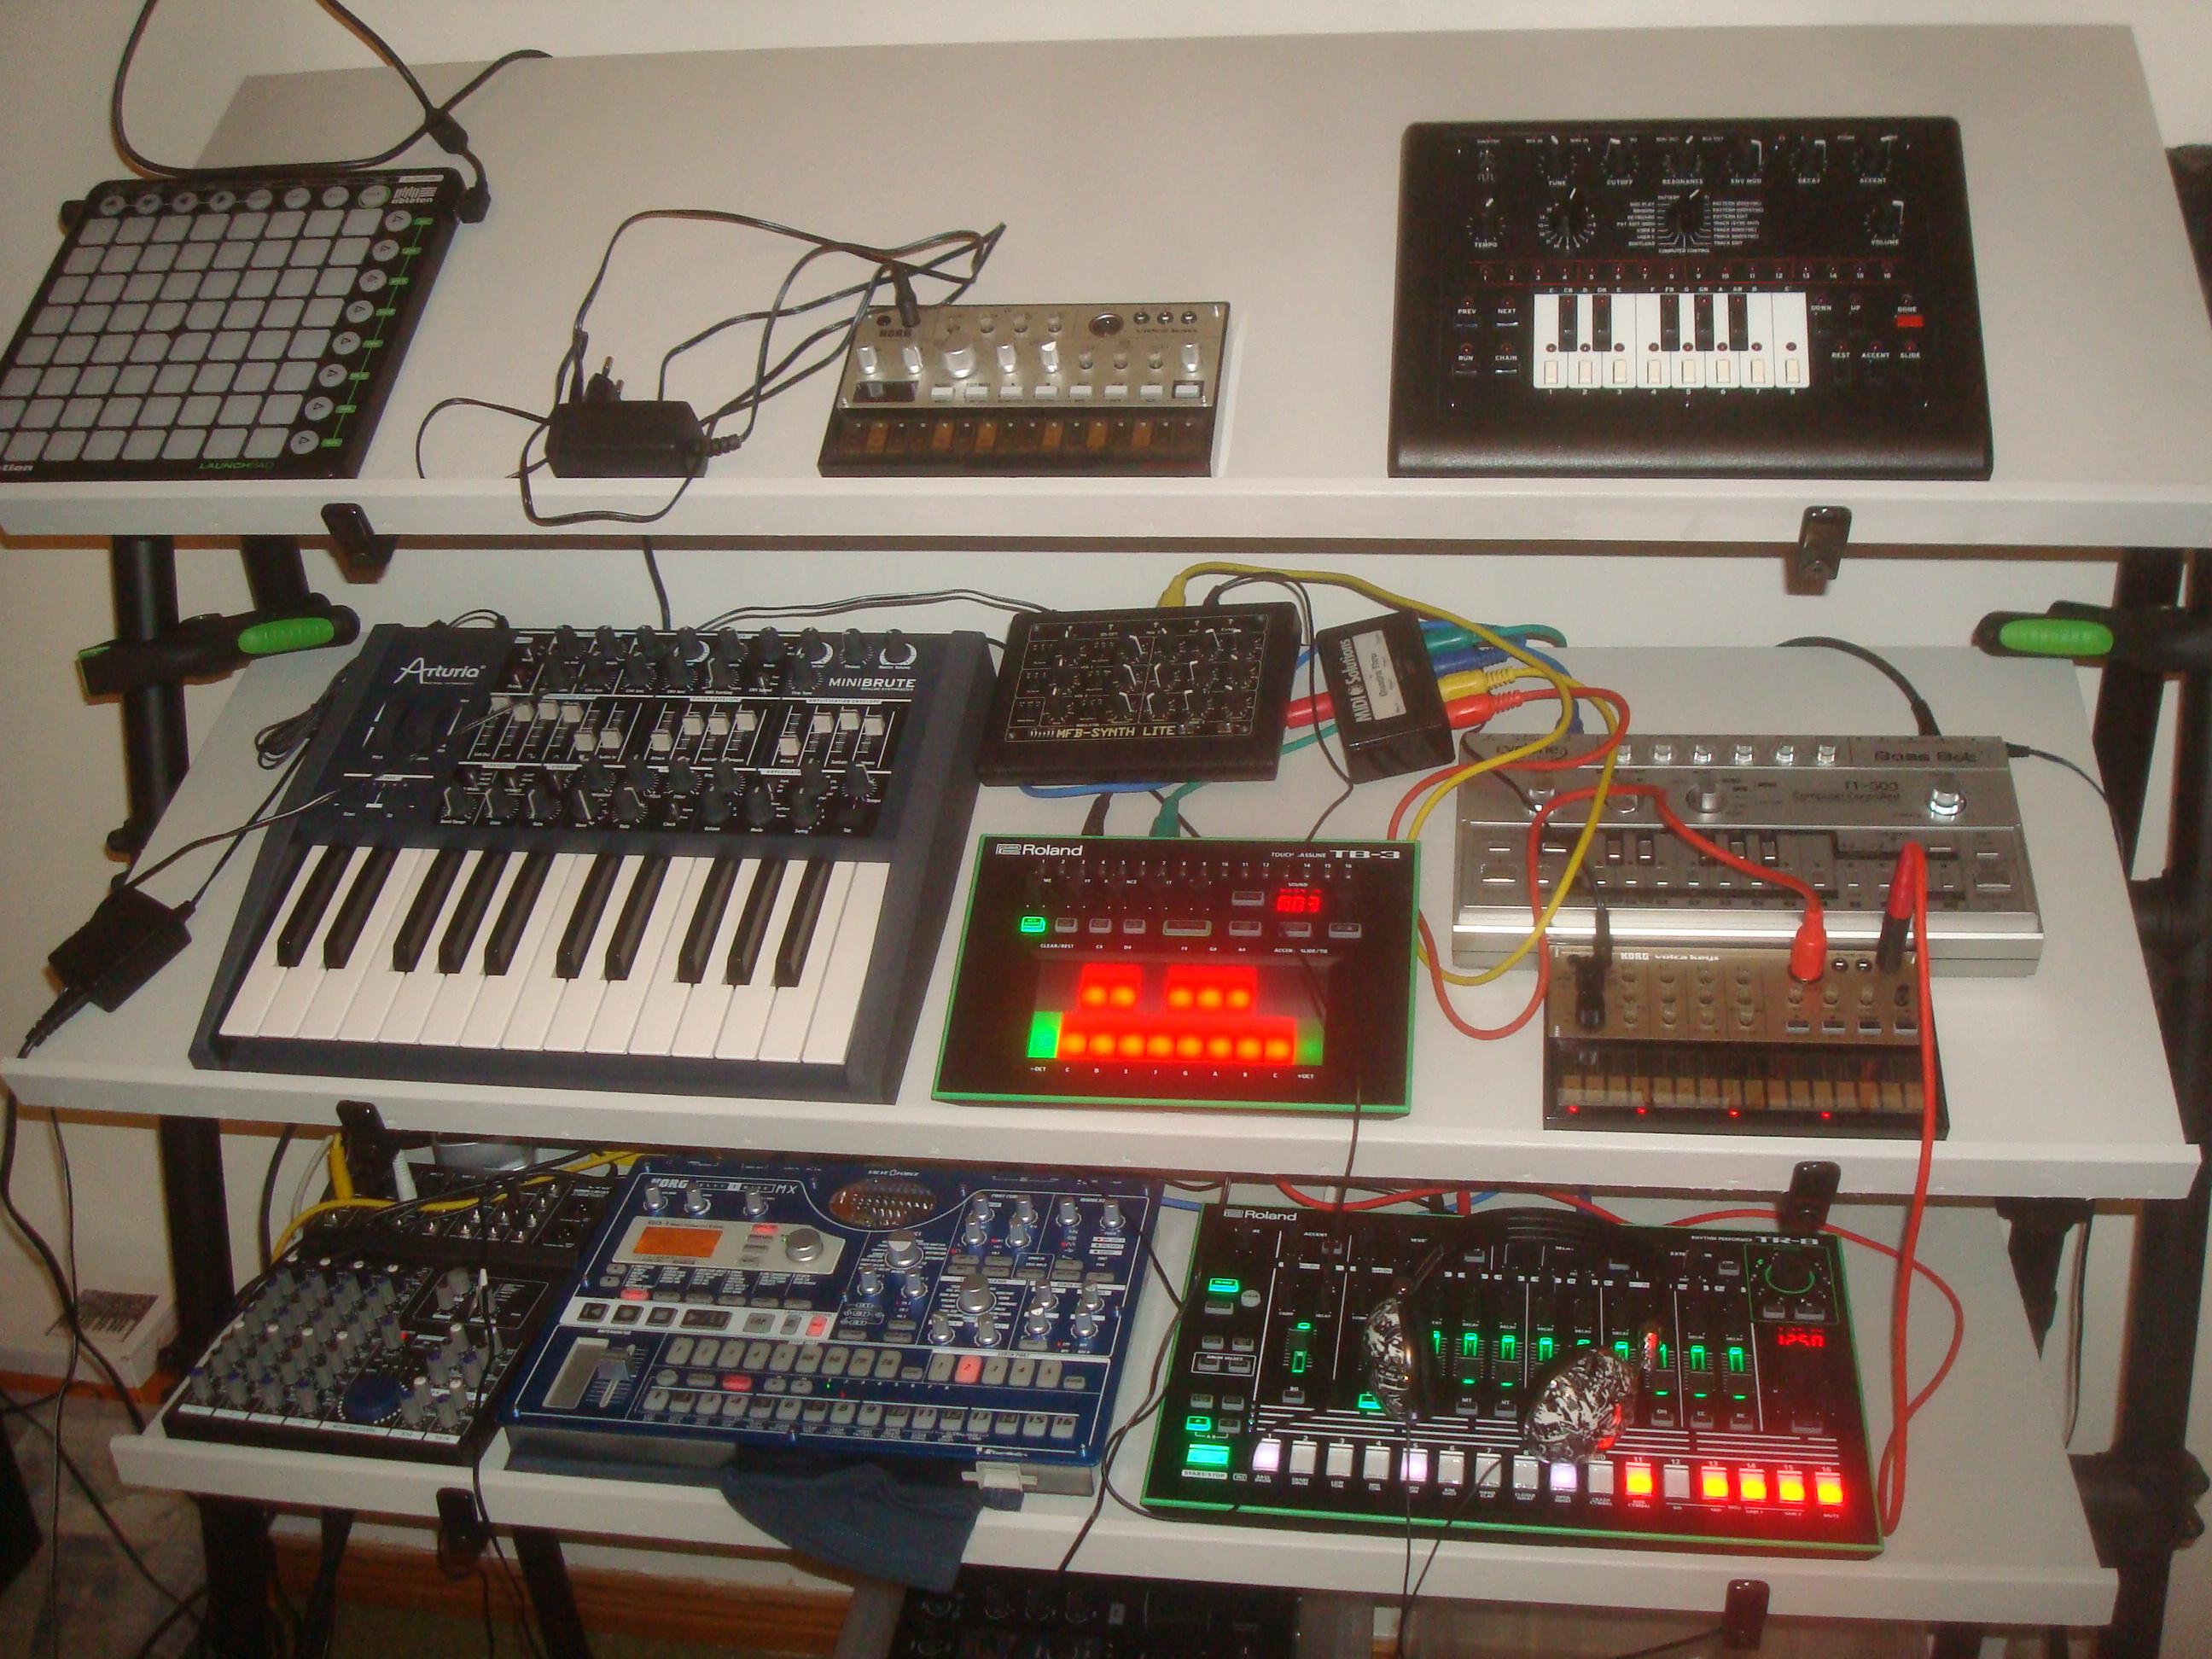 File:The gear - Novation LaunchPad, Korg Volca Bass ...